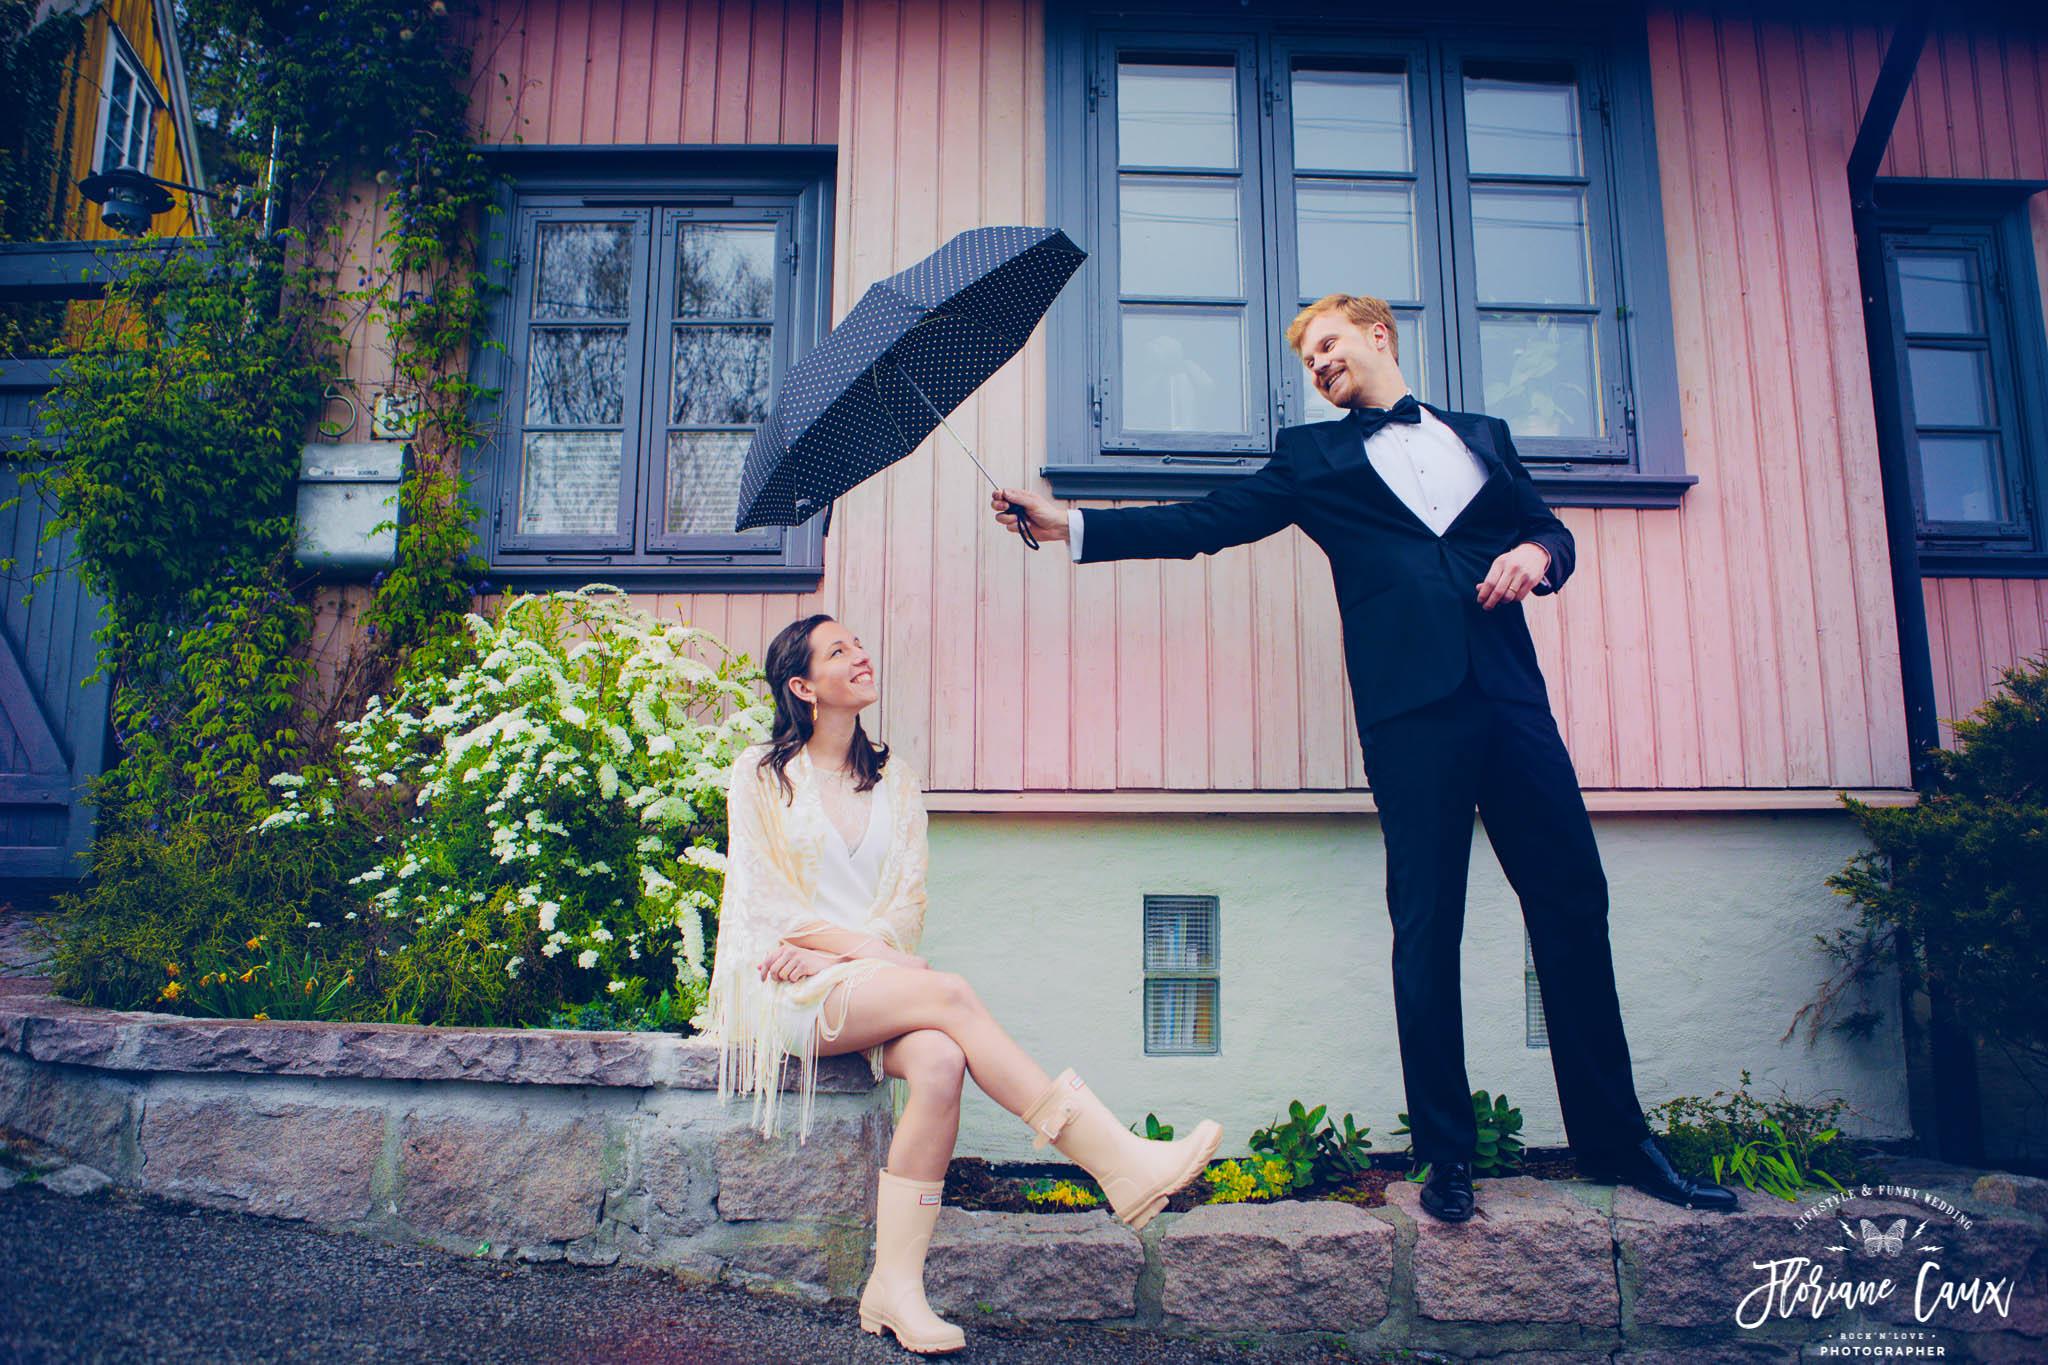 destination-wedding-photographer-oslo-norway-floriane-caux-7